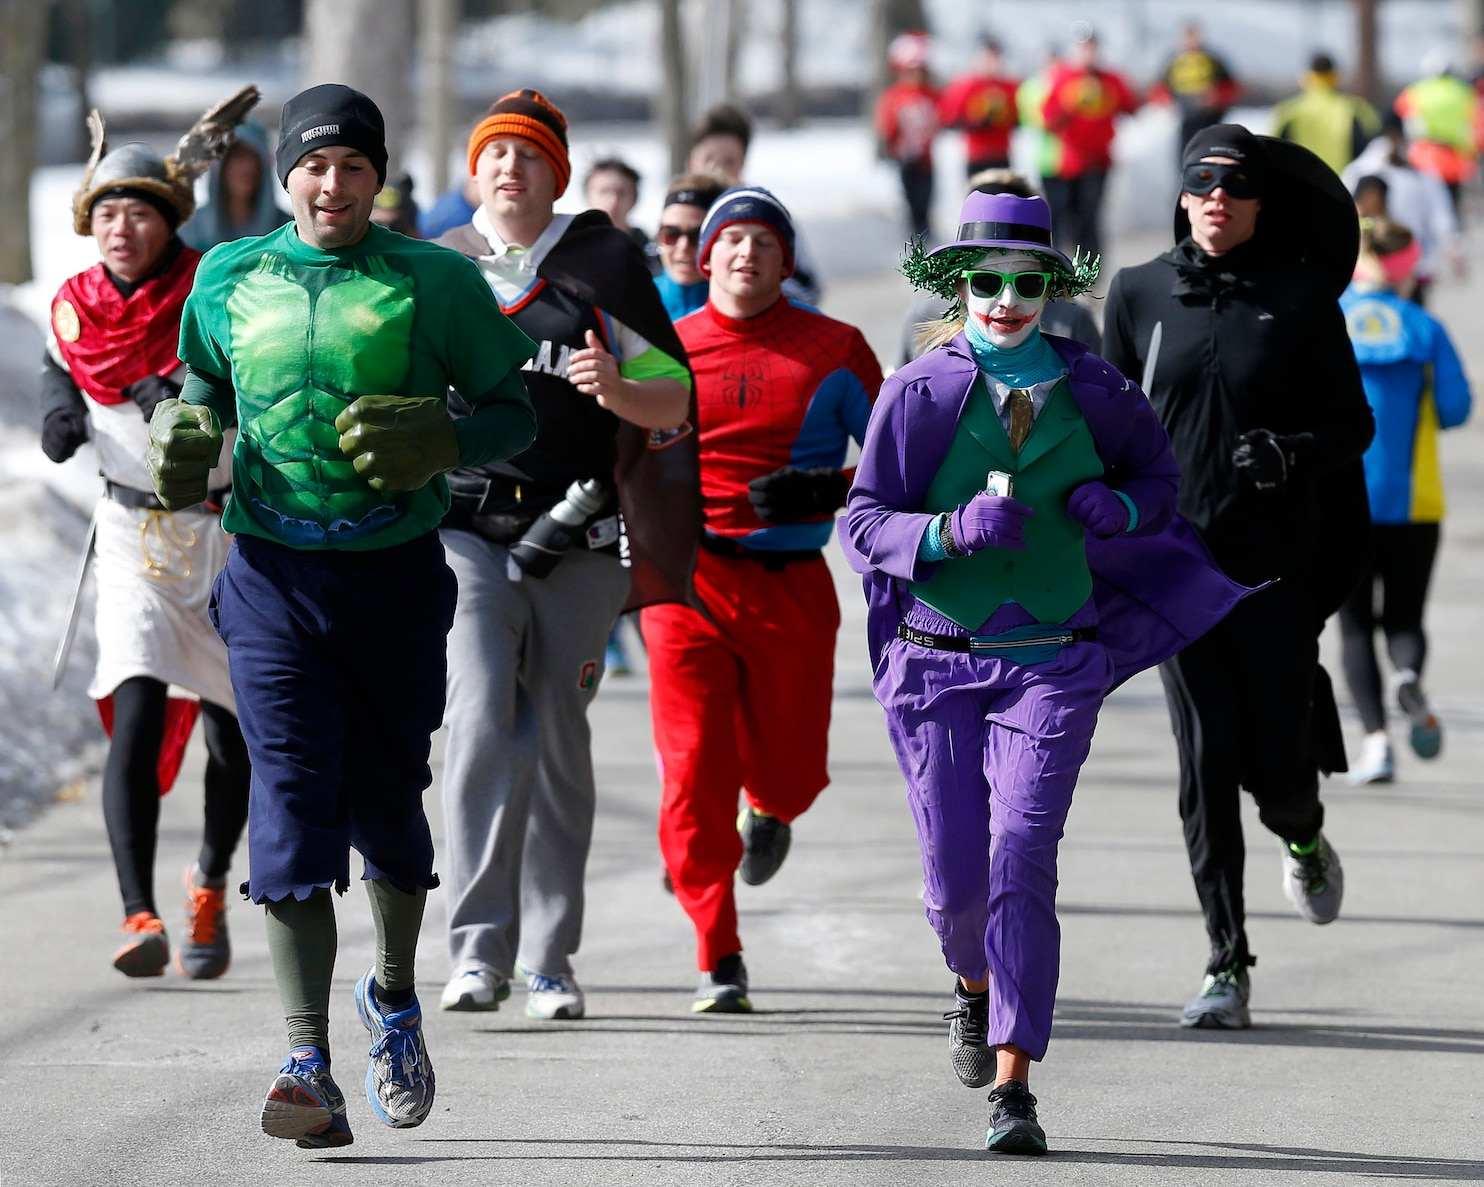 Runners In Superhero Costumes Prepare For Boston Marathon